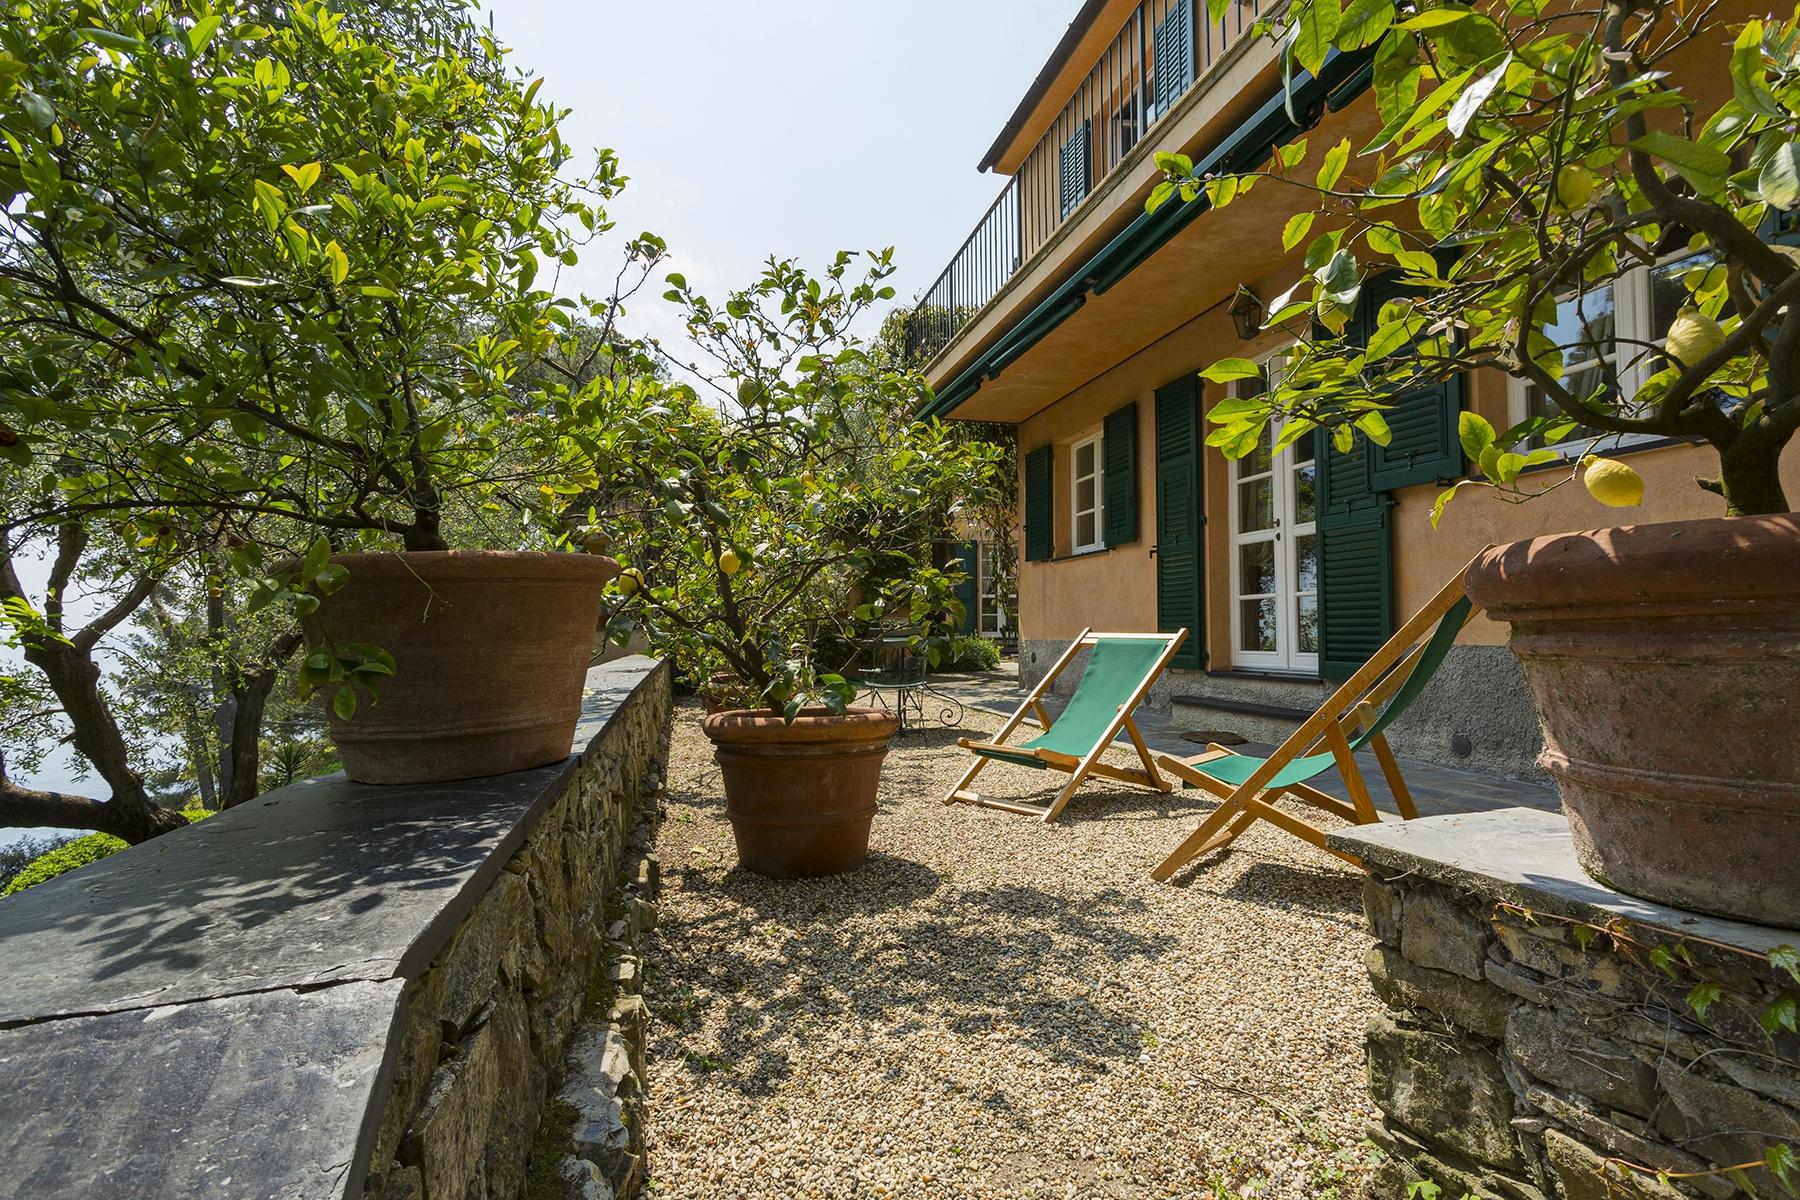 Villa in Vendita a Santa Margherita Ligure: 5 locali, 580 mq - Foto 11